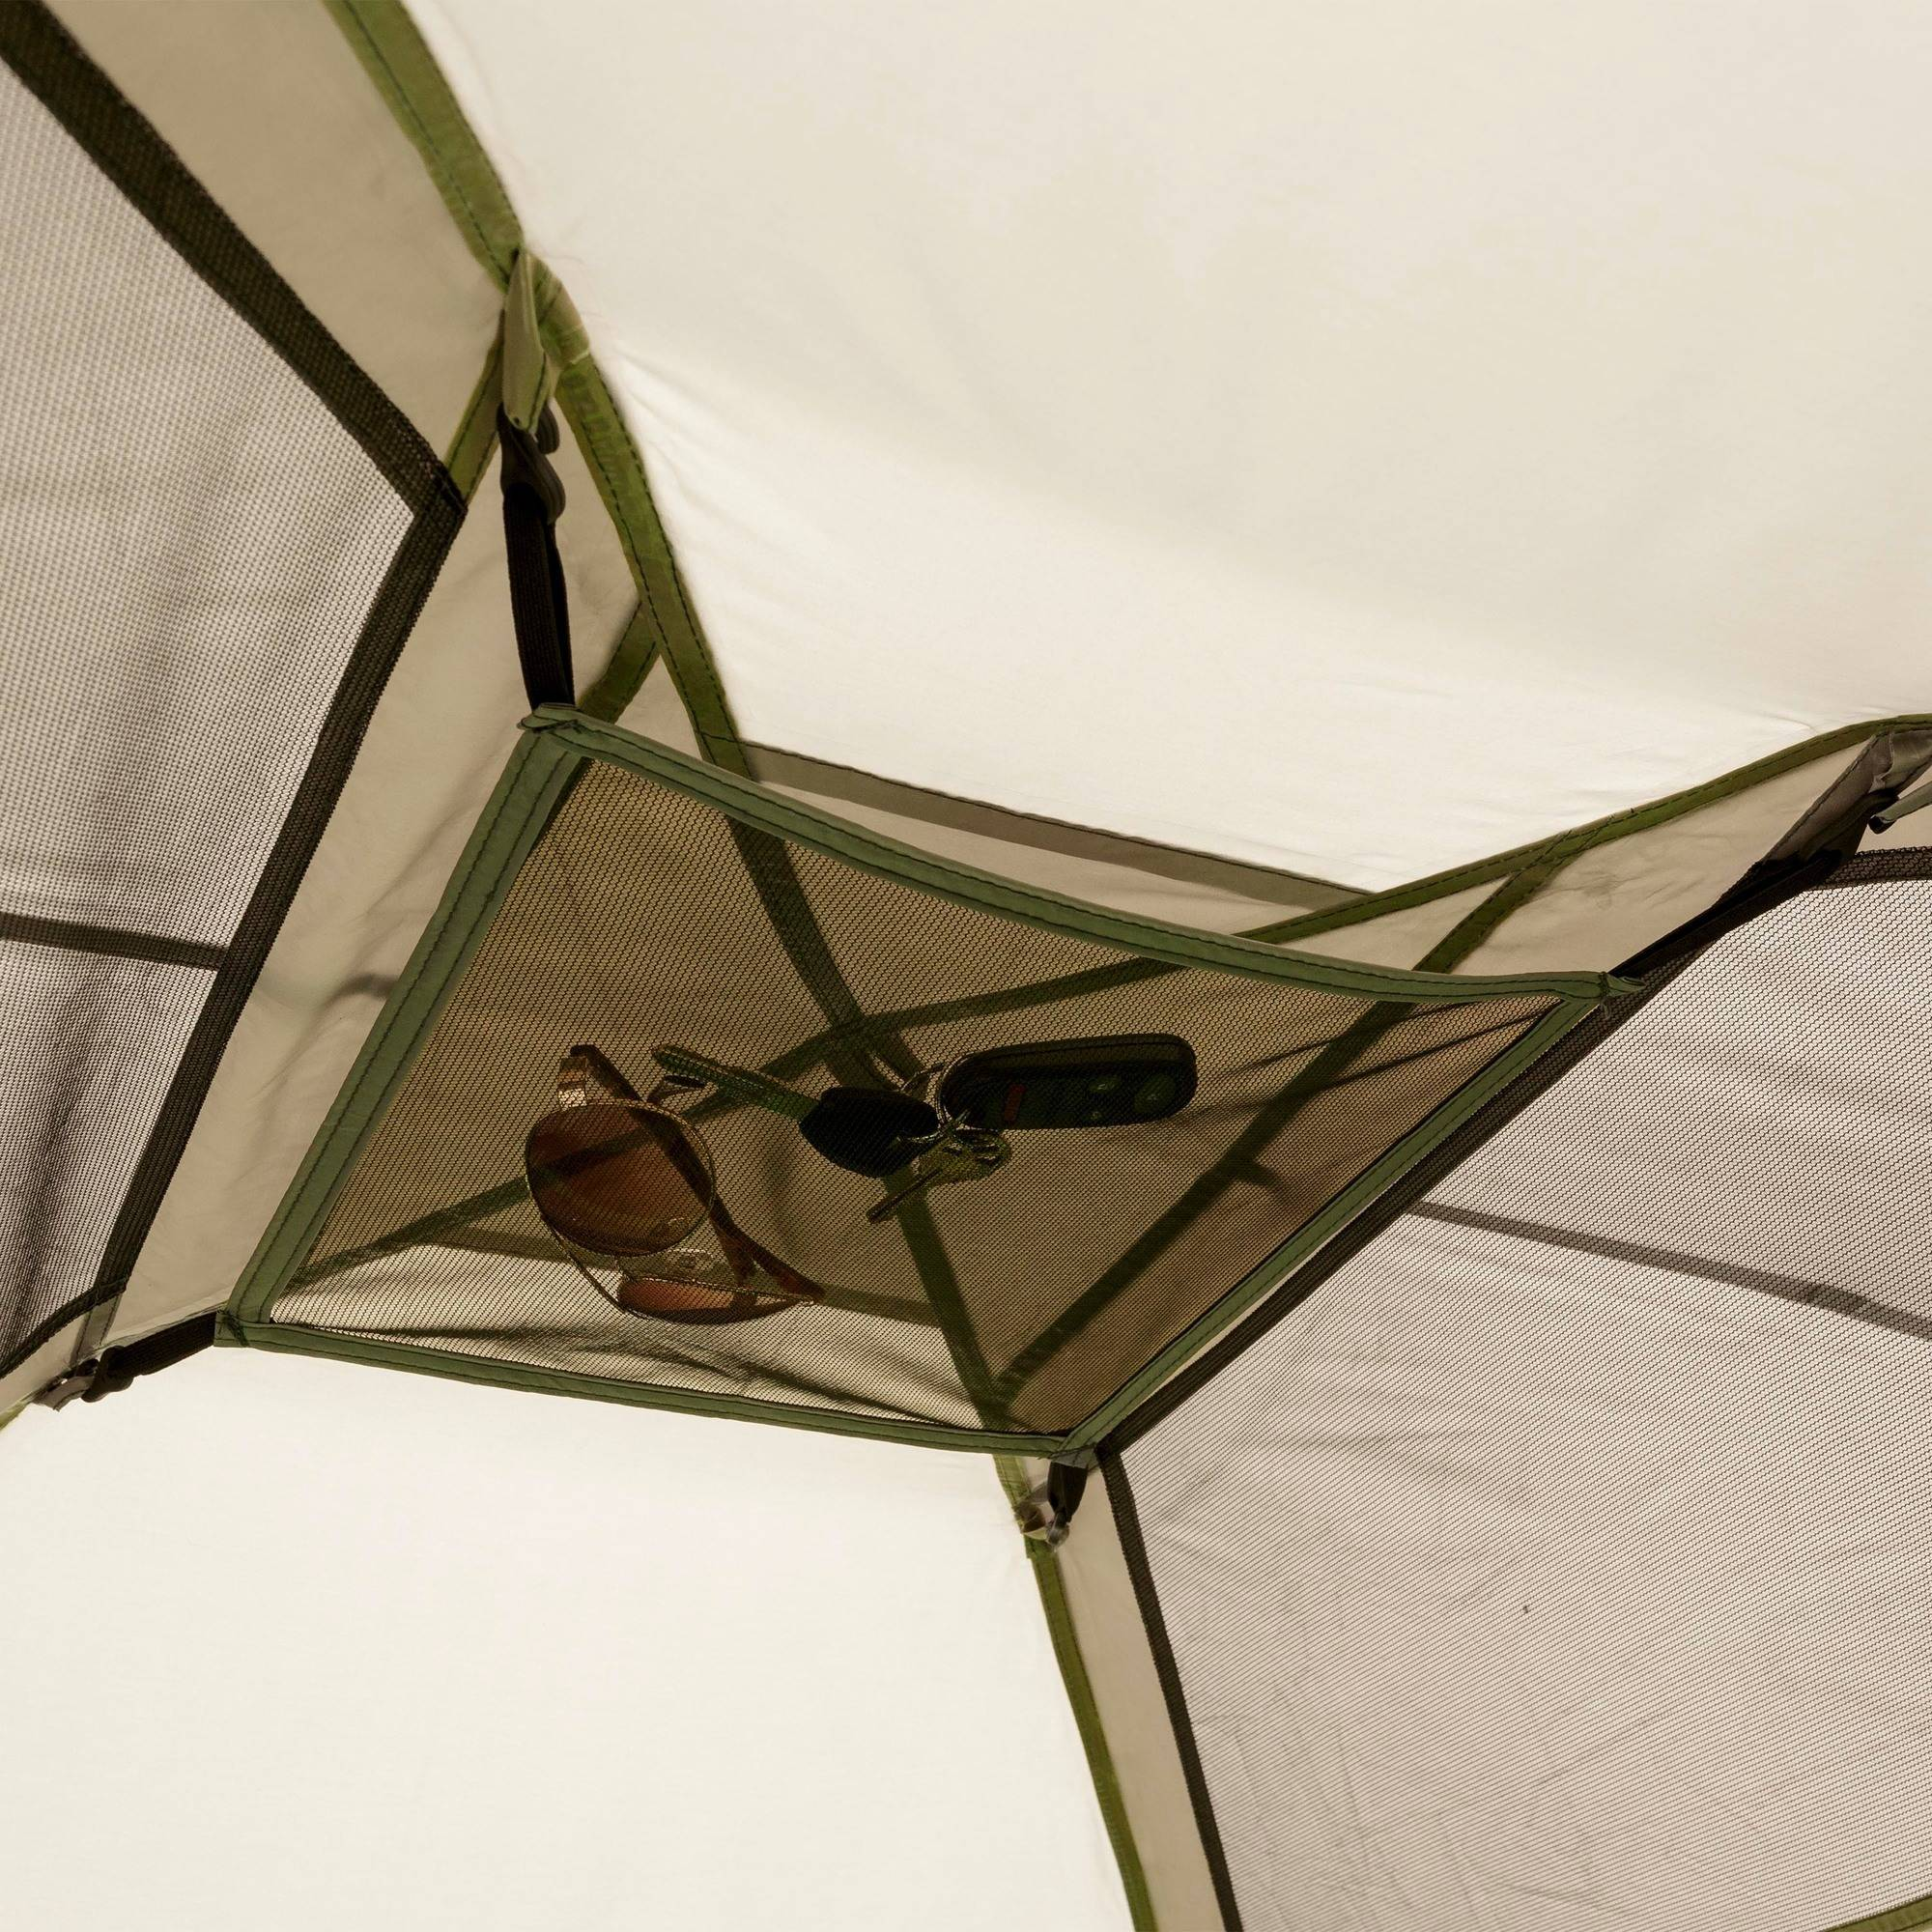 & Ozark Trail 6 Person Instant Cabin Tent - Walmart.com